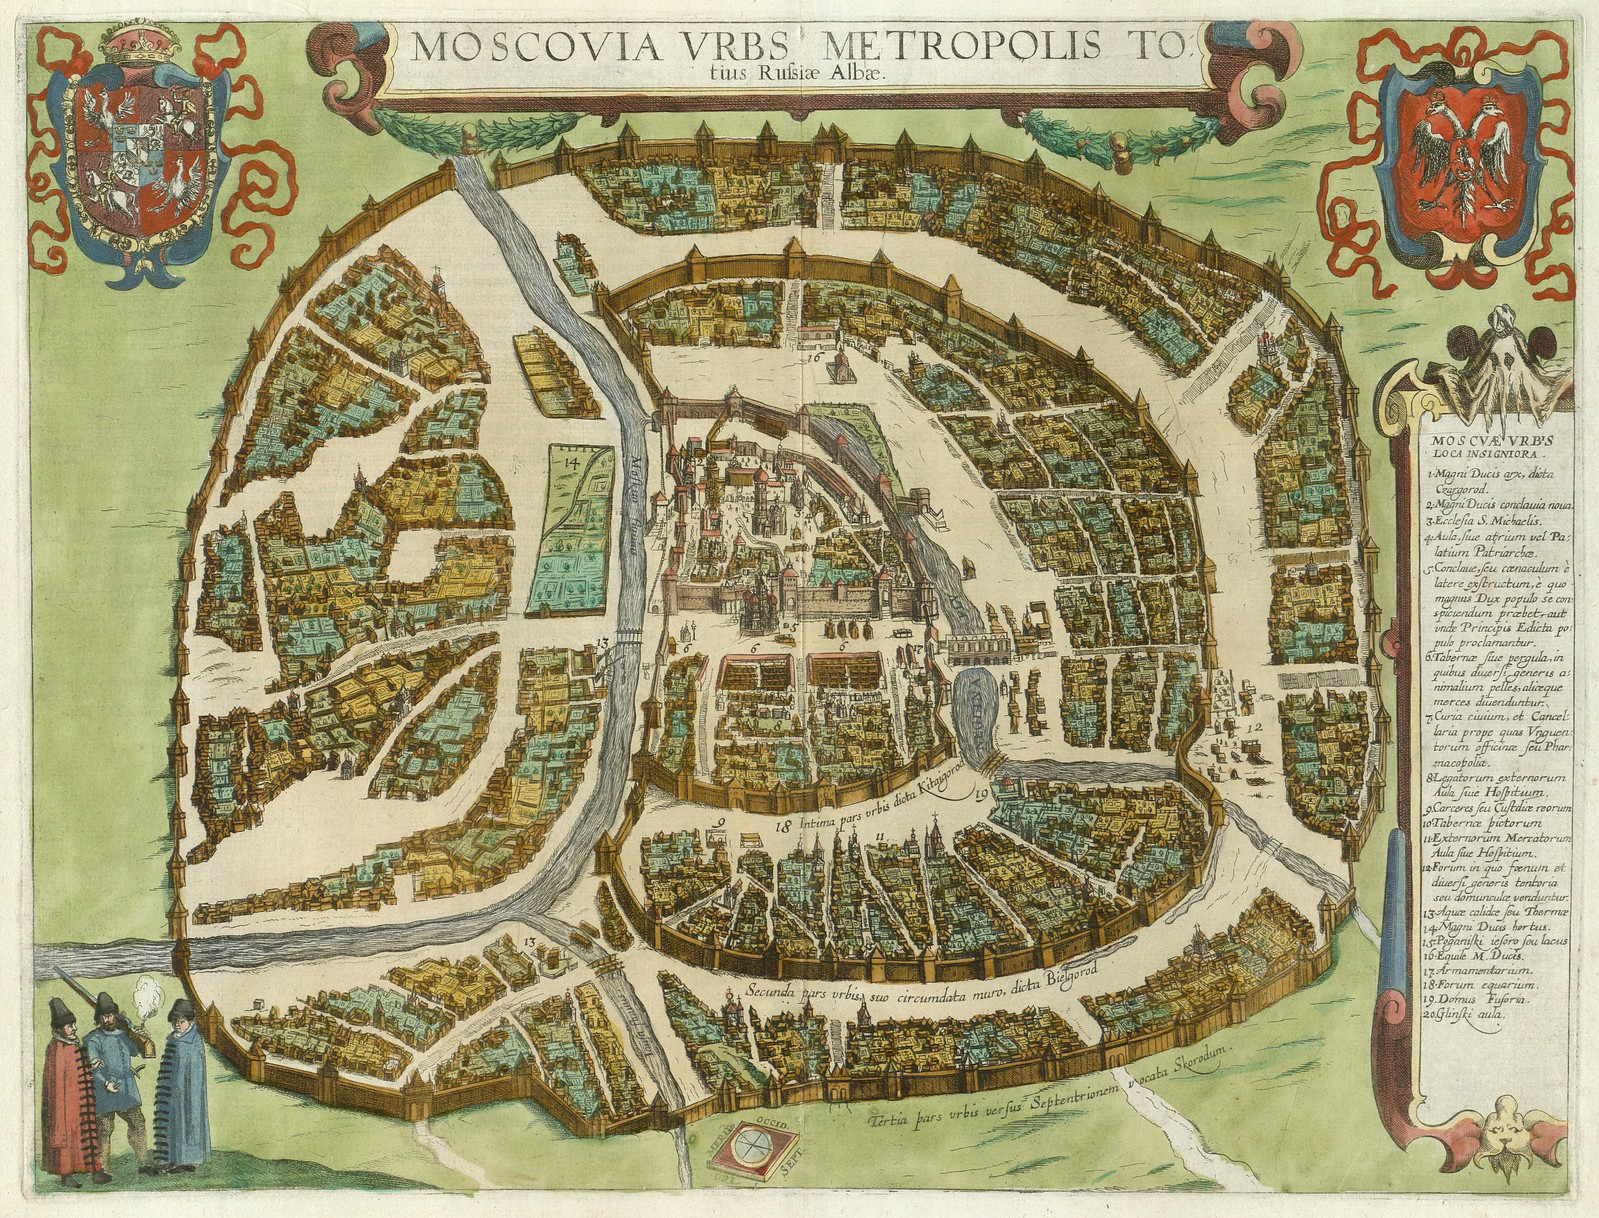 1612-1618. Москва мегаполис Белой Руси, Франц Браун, Георг Хогенберг, Köln